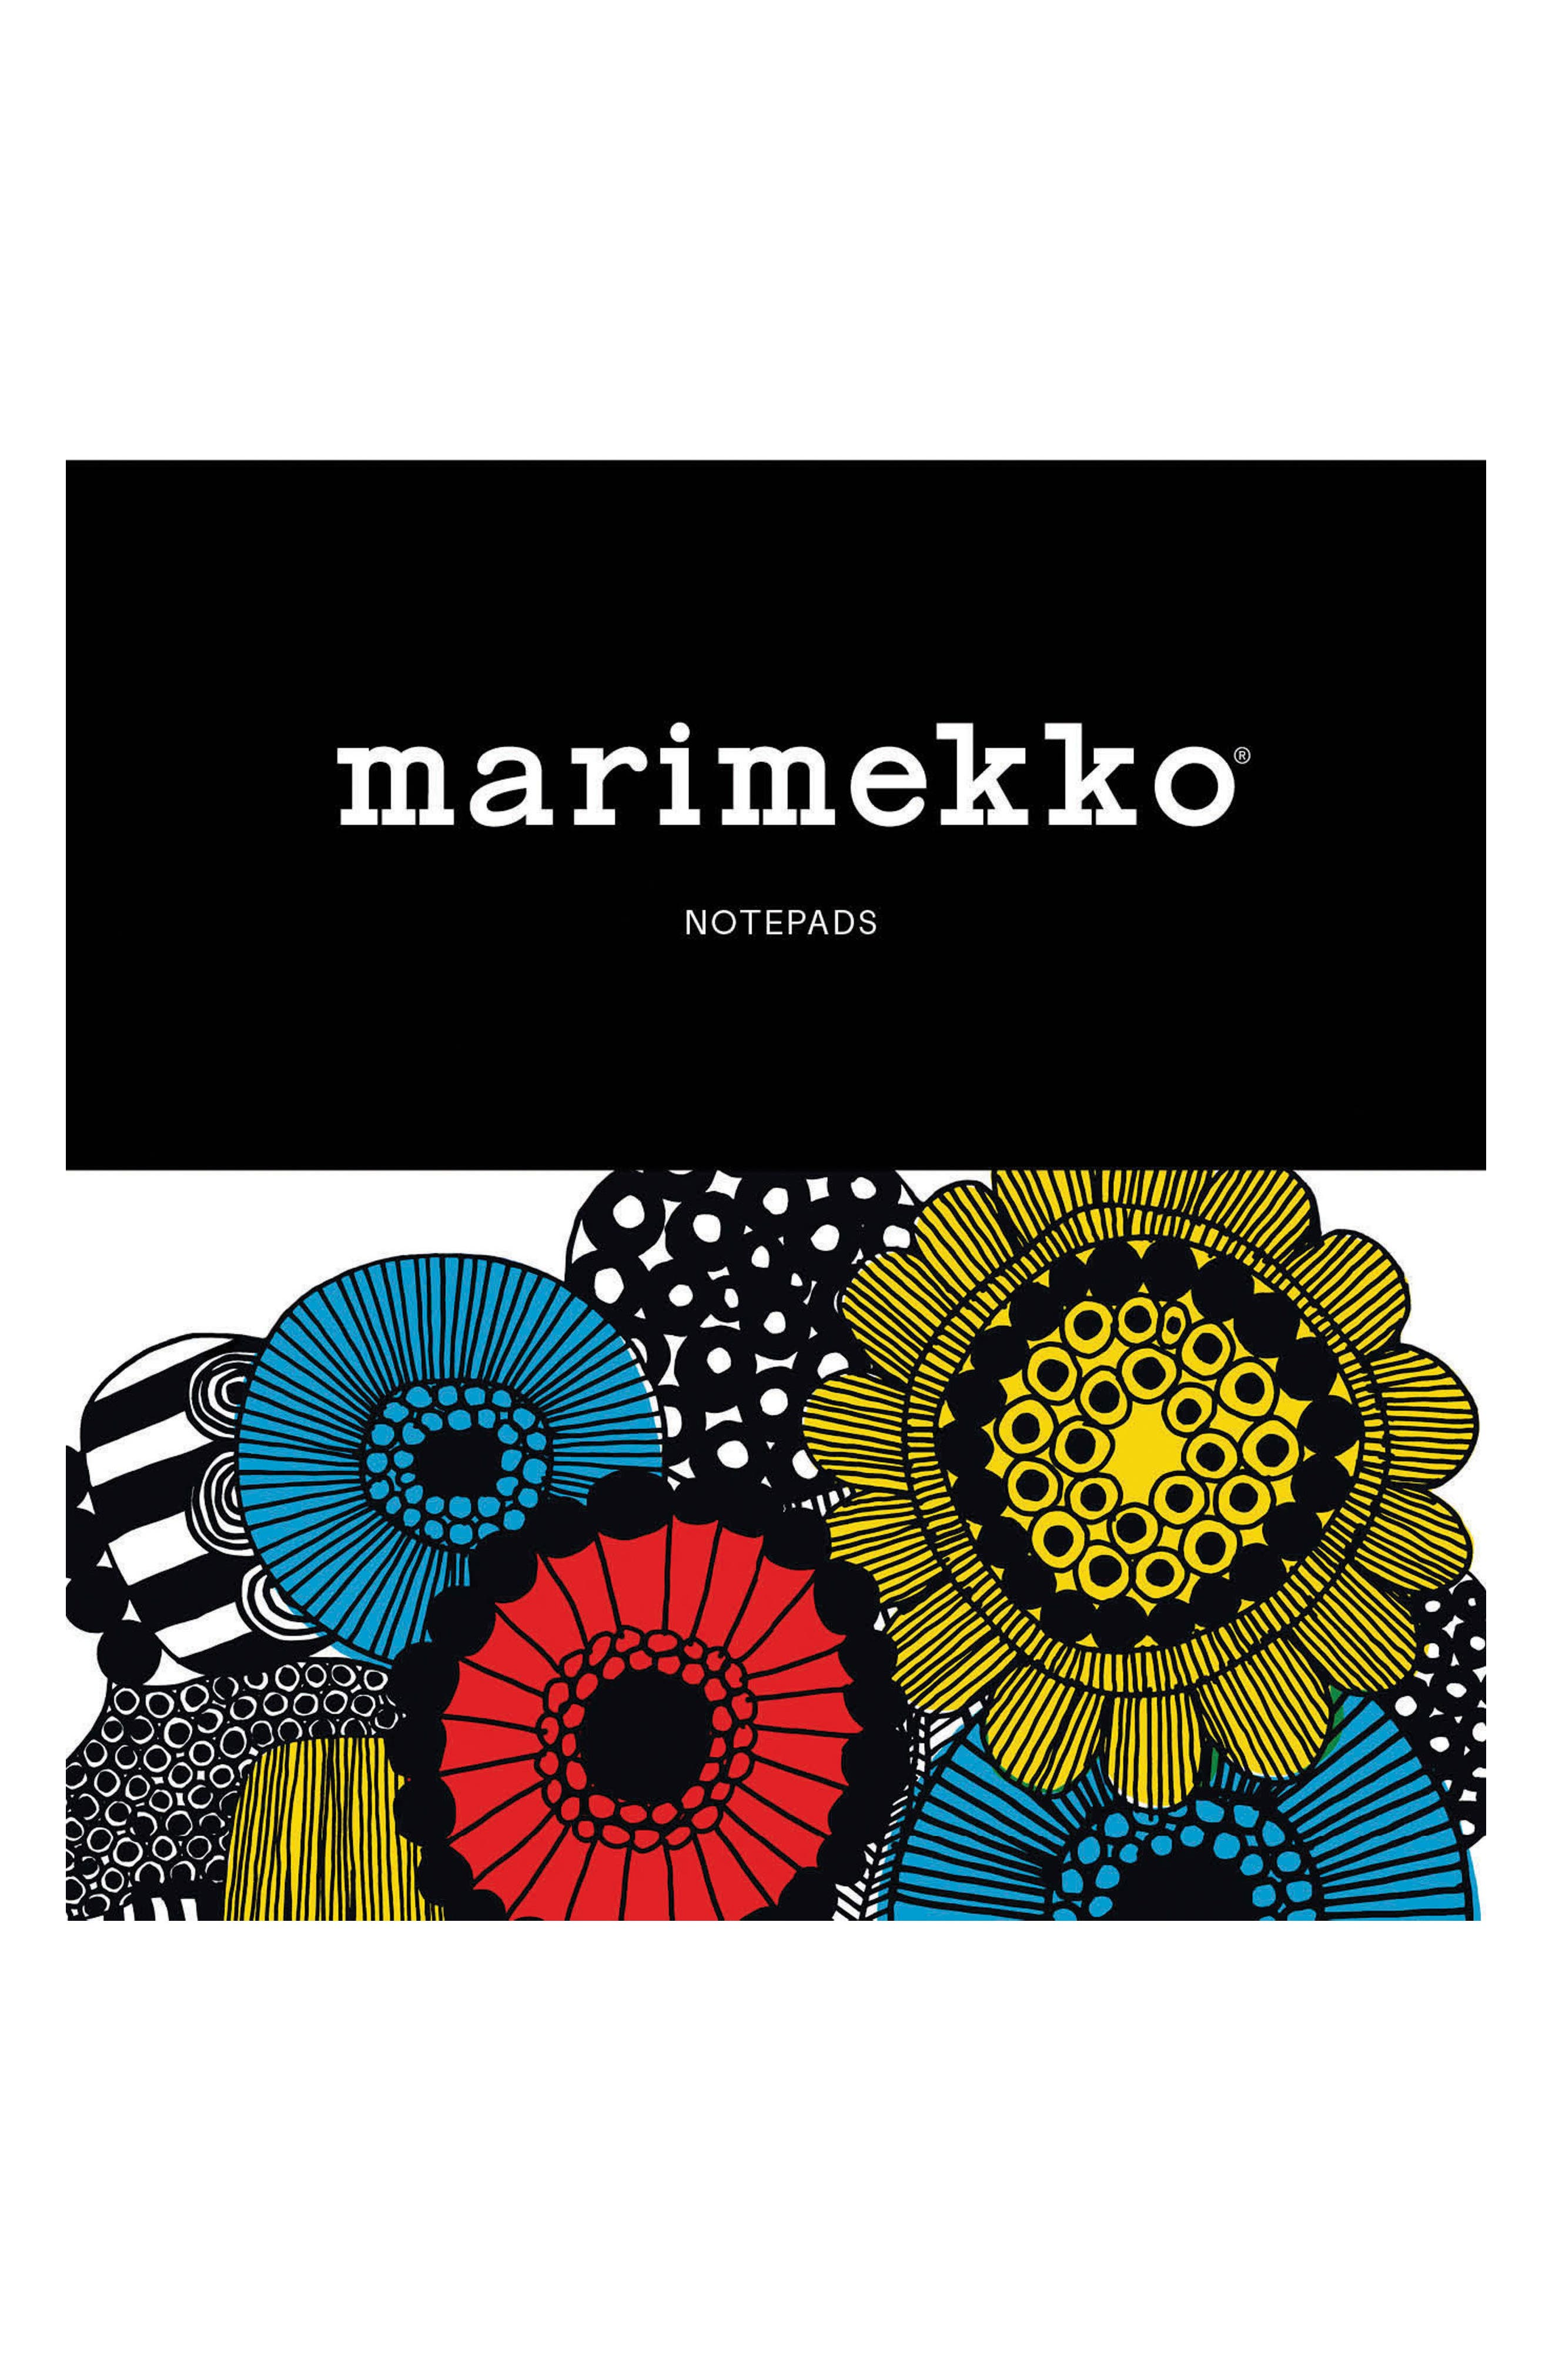 2-Pack Marimekko Notepads,                             Main thumbnail 1, color,                             Multi